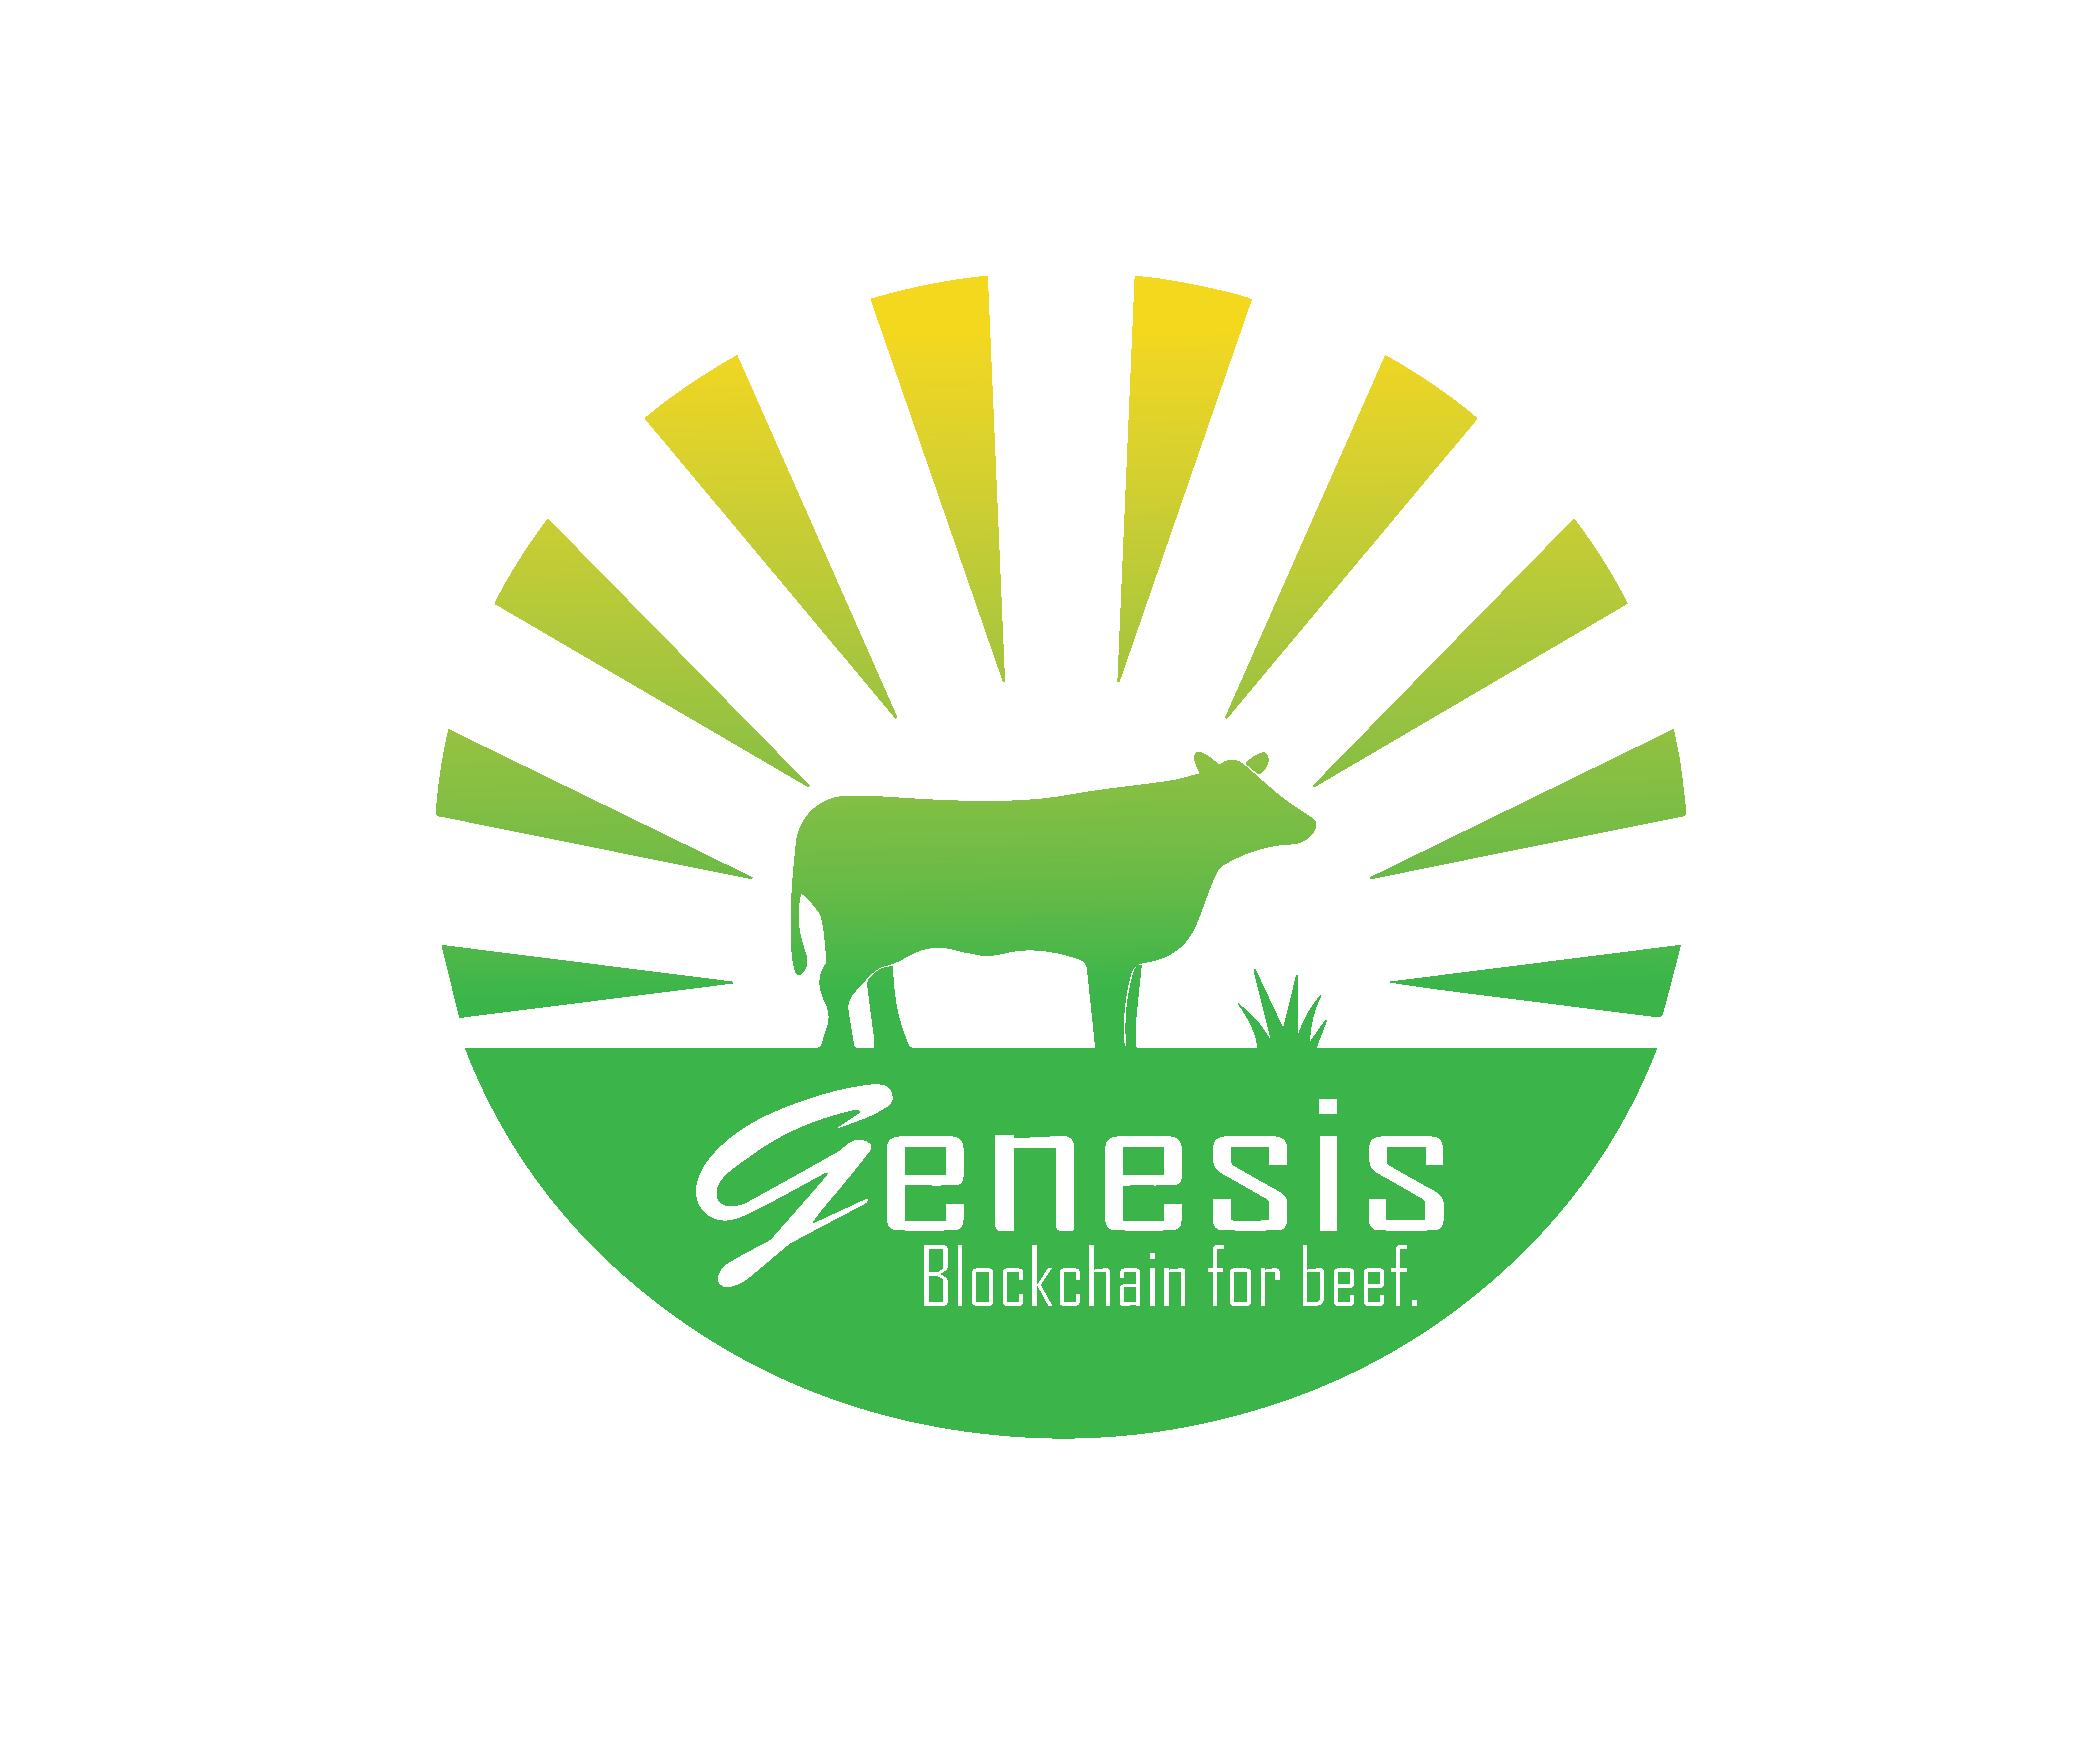 Genesis Blockchain for Beef